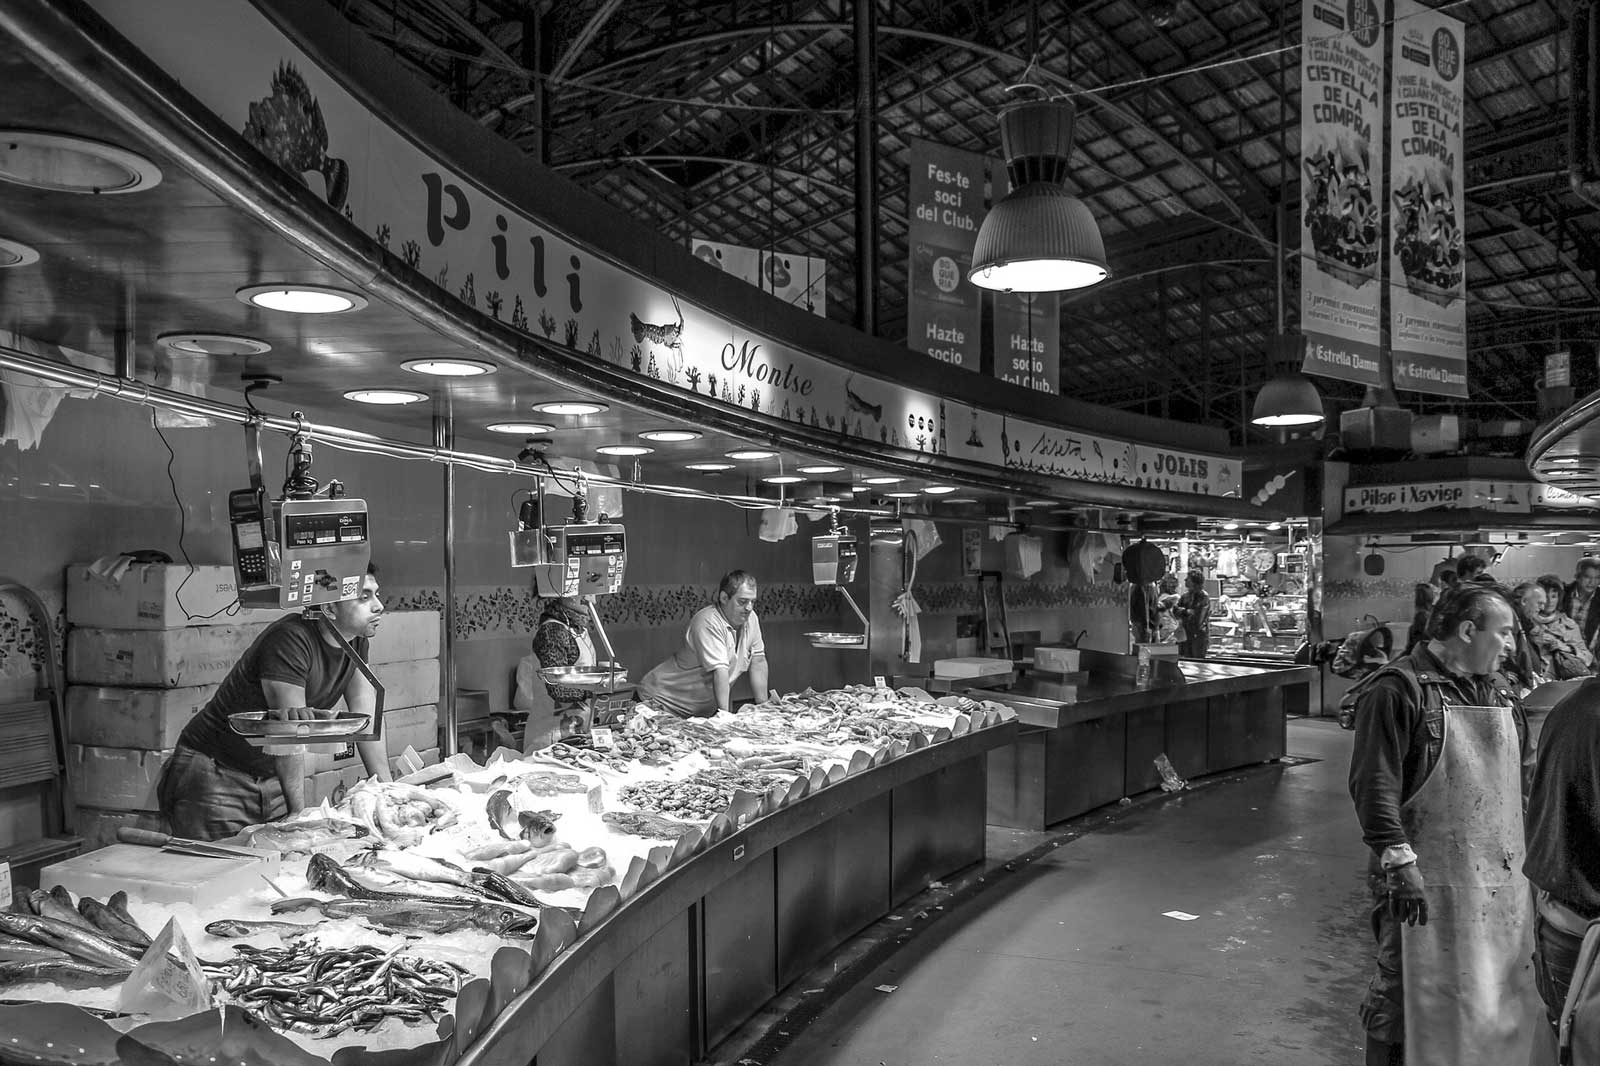 fish-market-428058